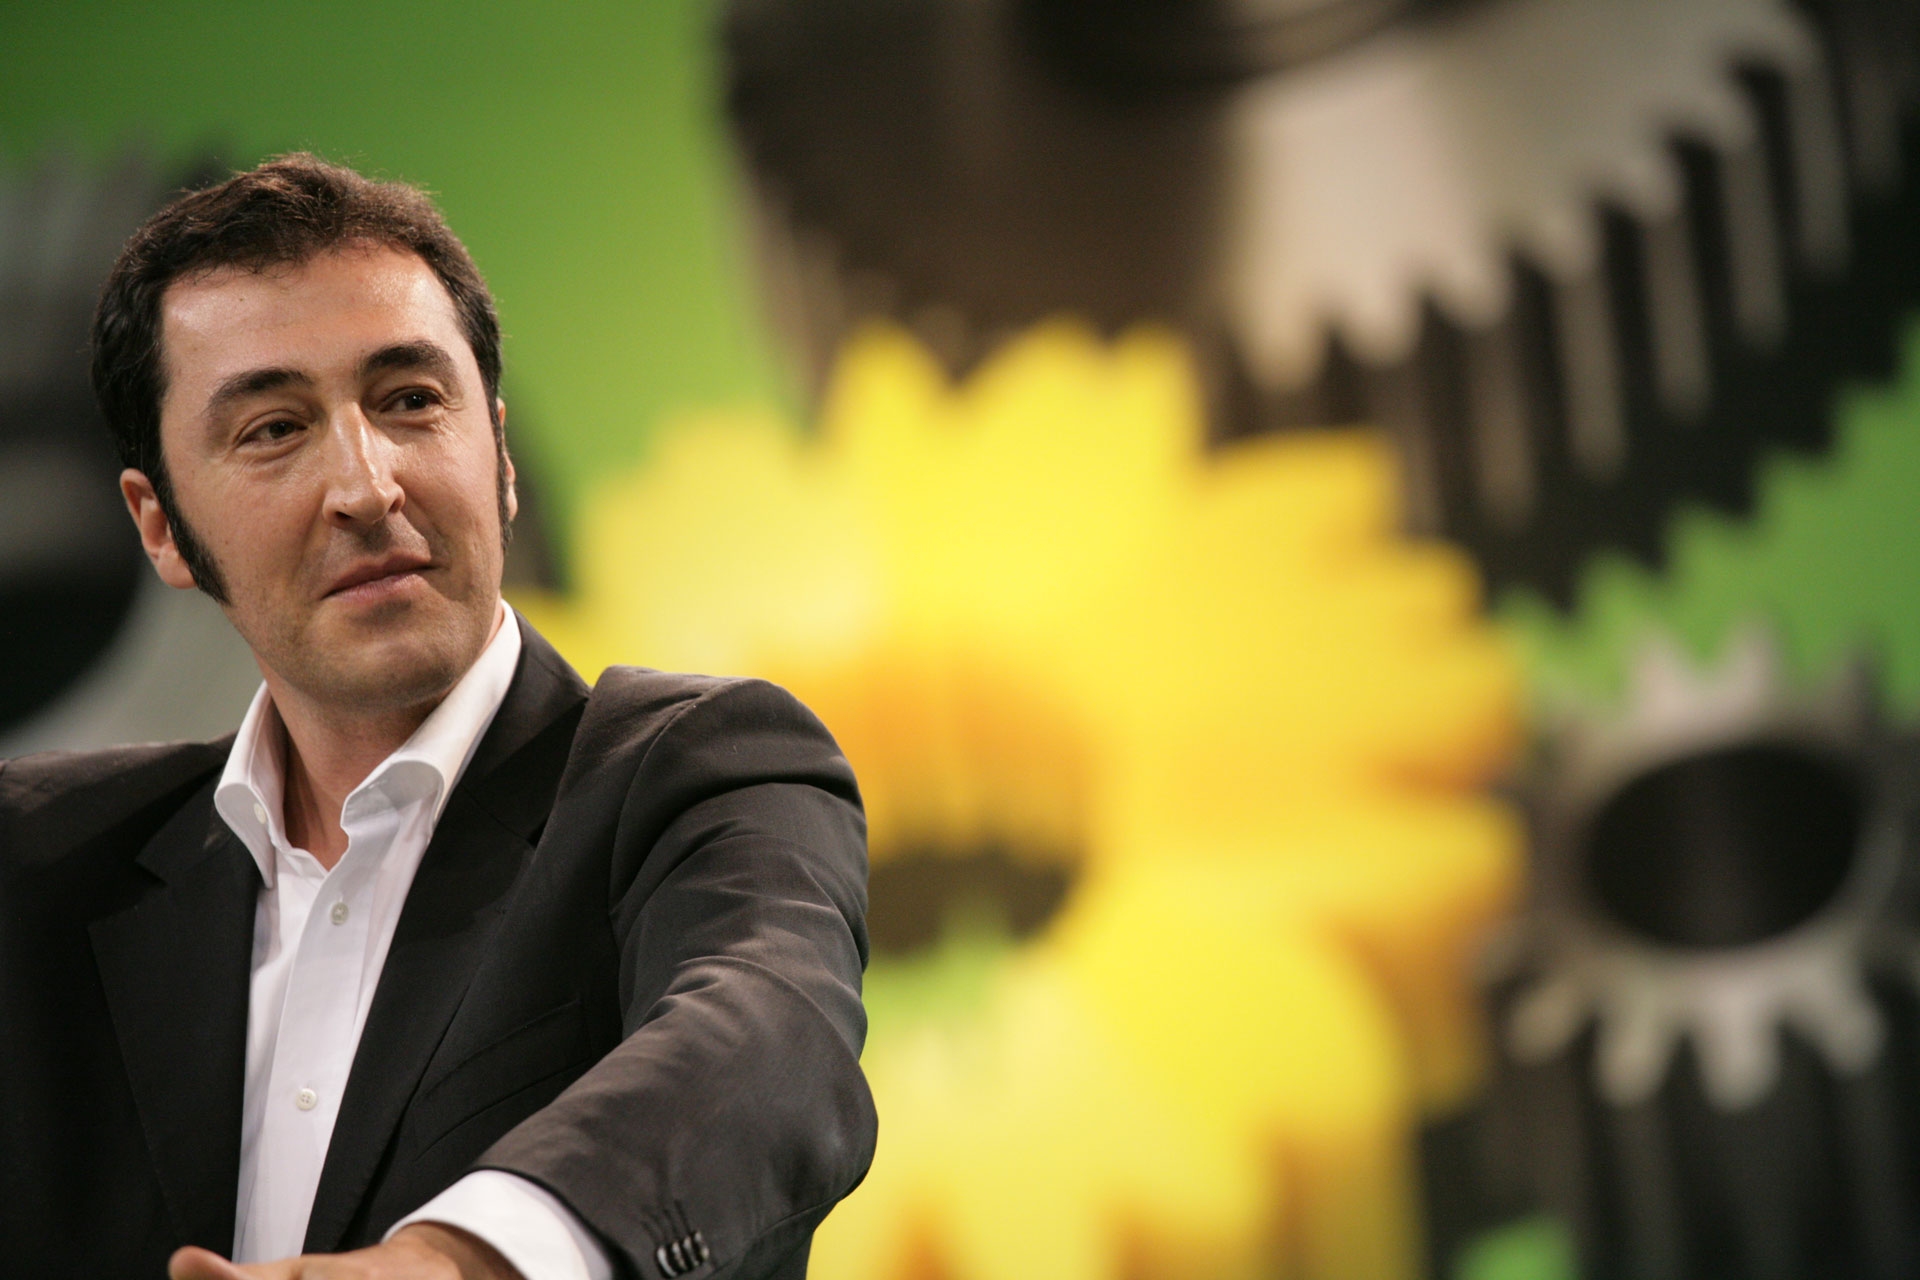 Cem Özdemir auf dem Bundesparteitag in Berlin /BÜNDNIS 90 - DIE GRÜNEN